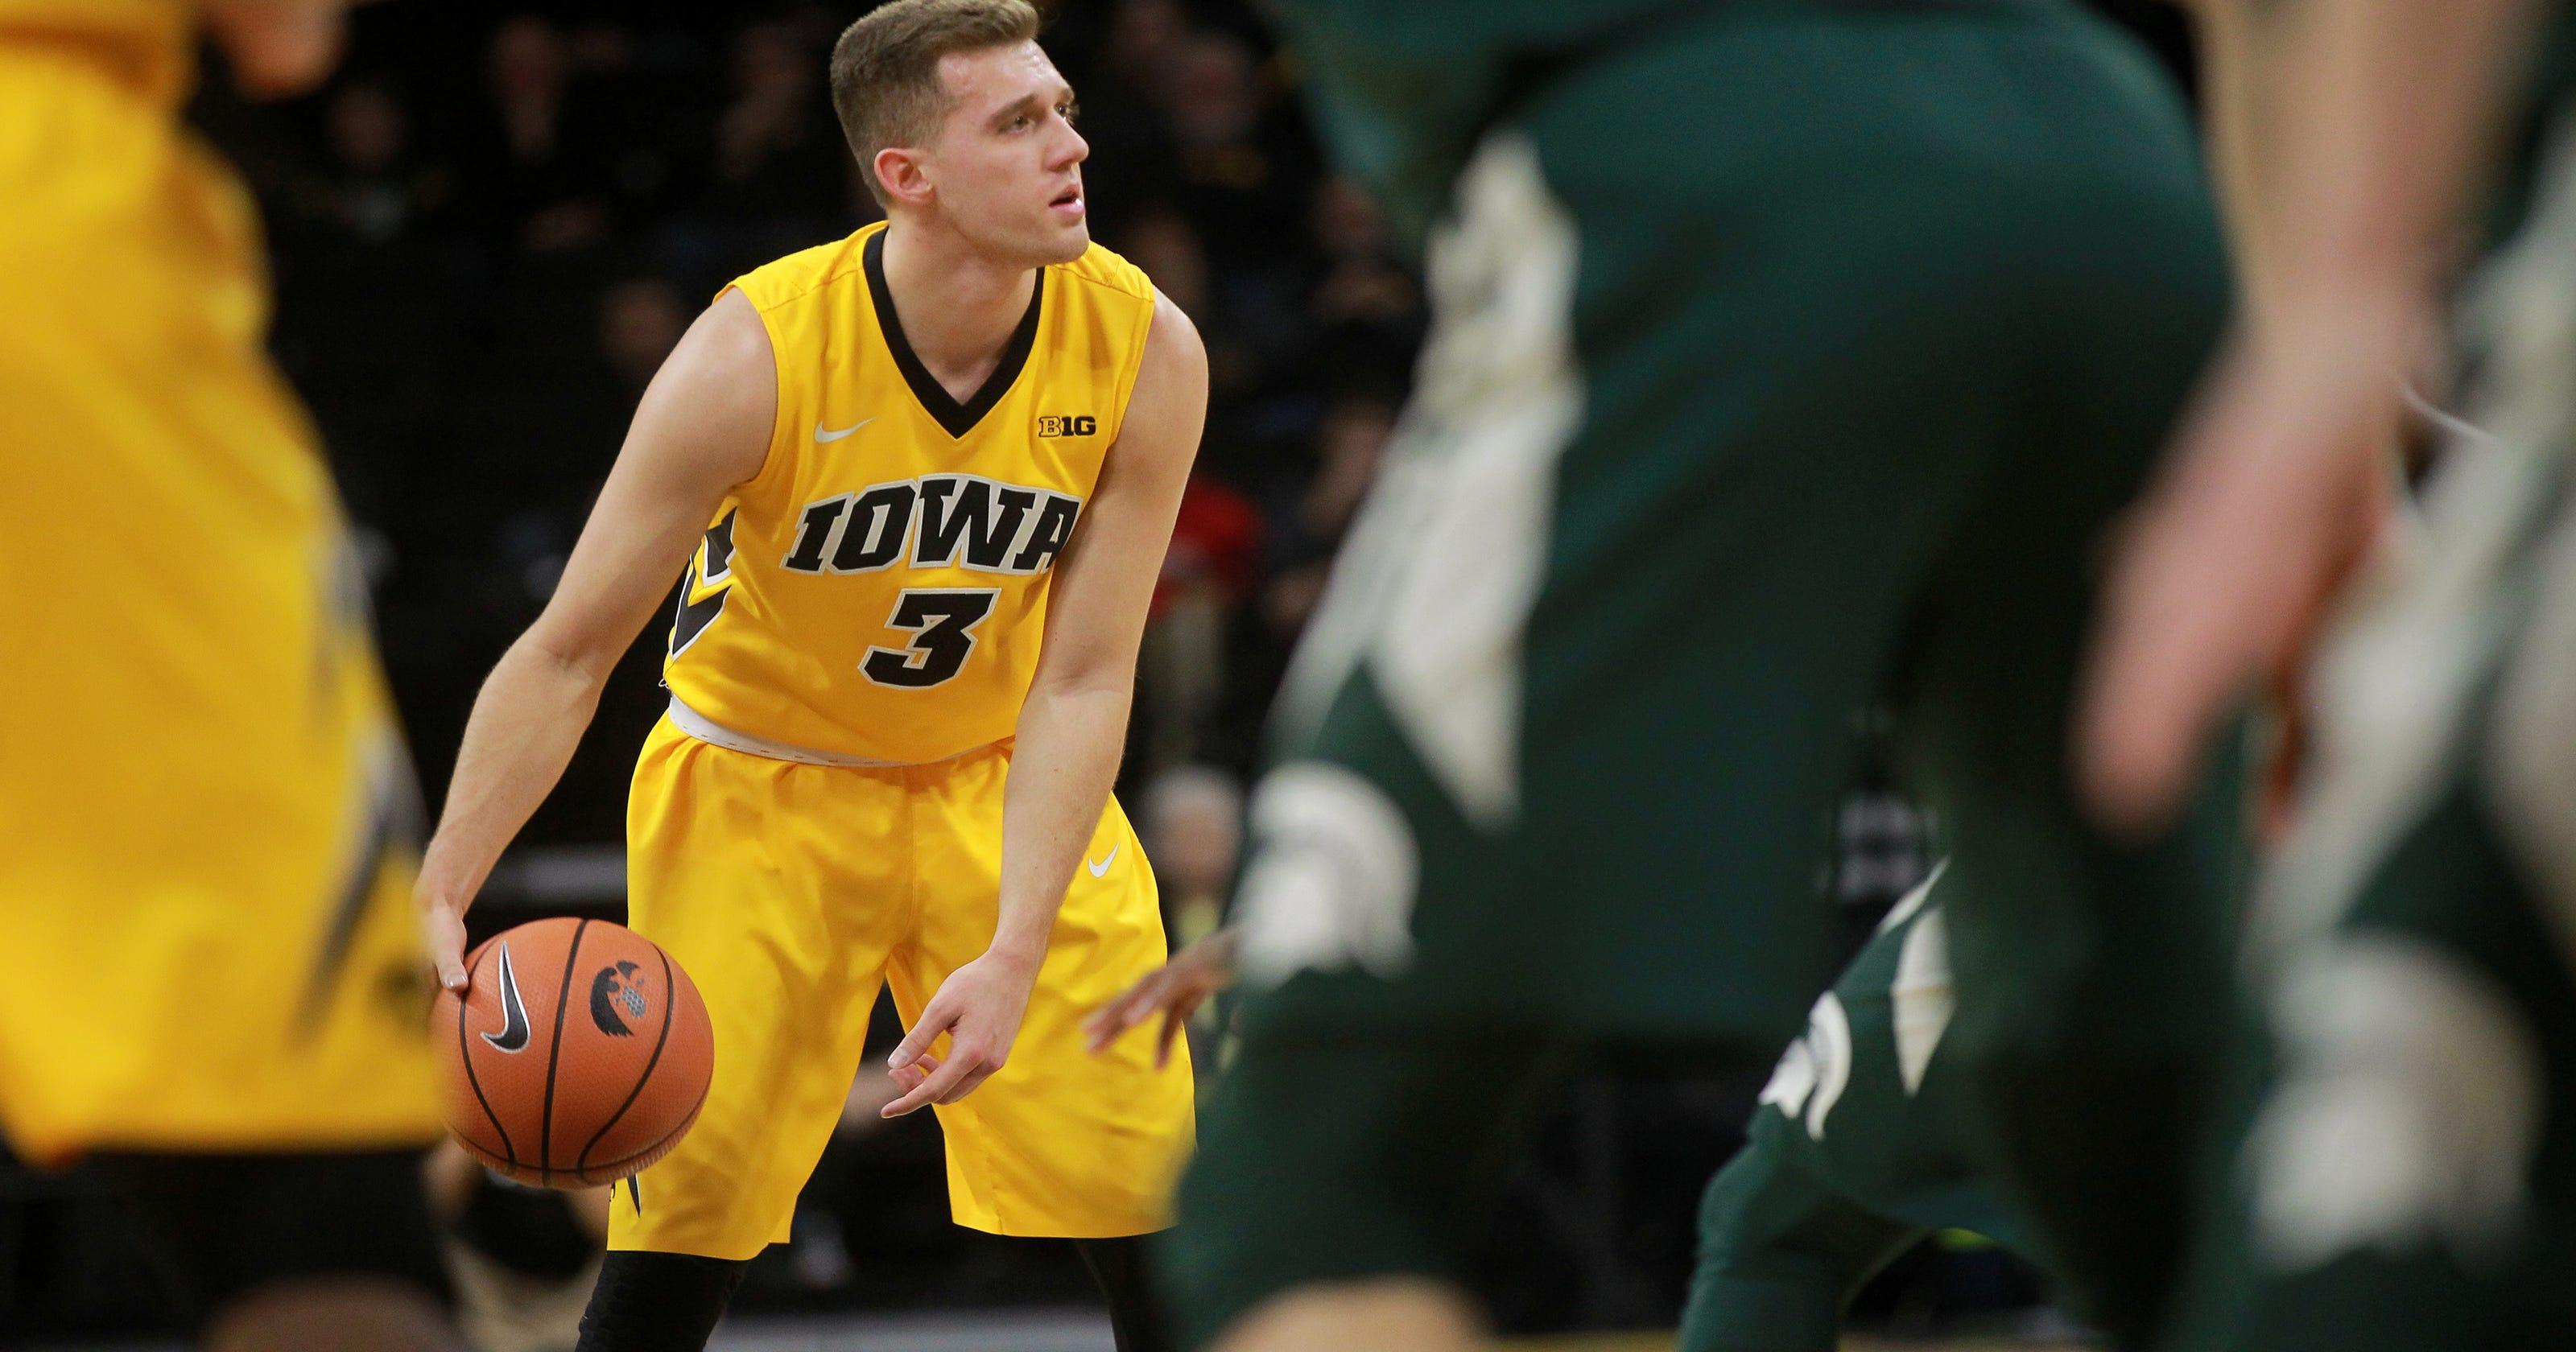 Sign ons | Iowa State University